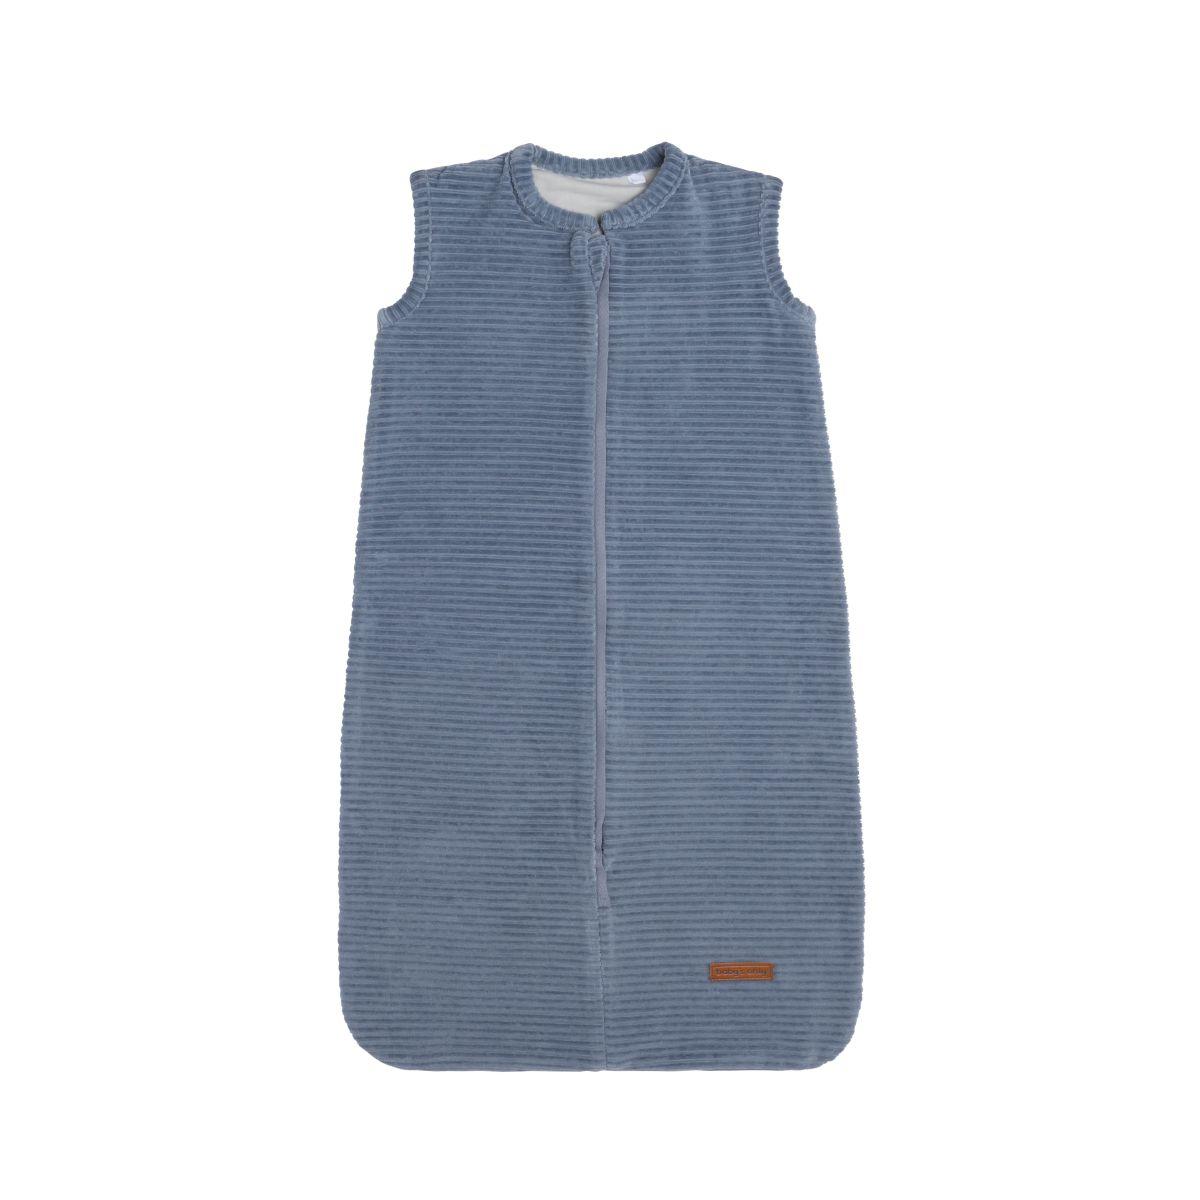 babys only bo02407303849 sense slaapzak vintage blue 70 cm 1